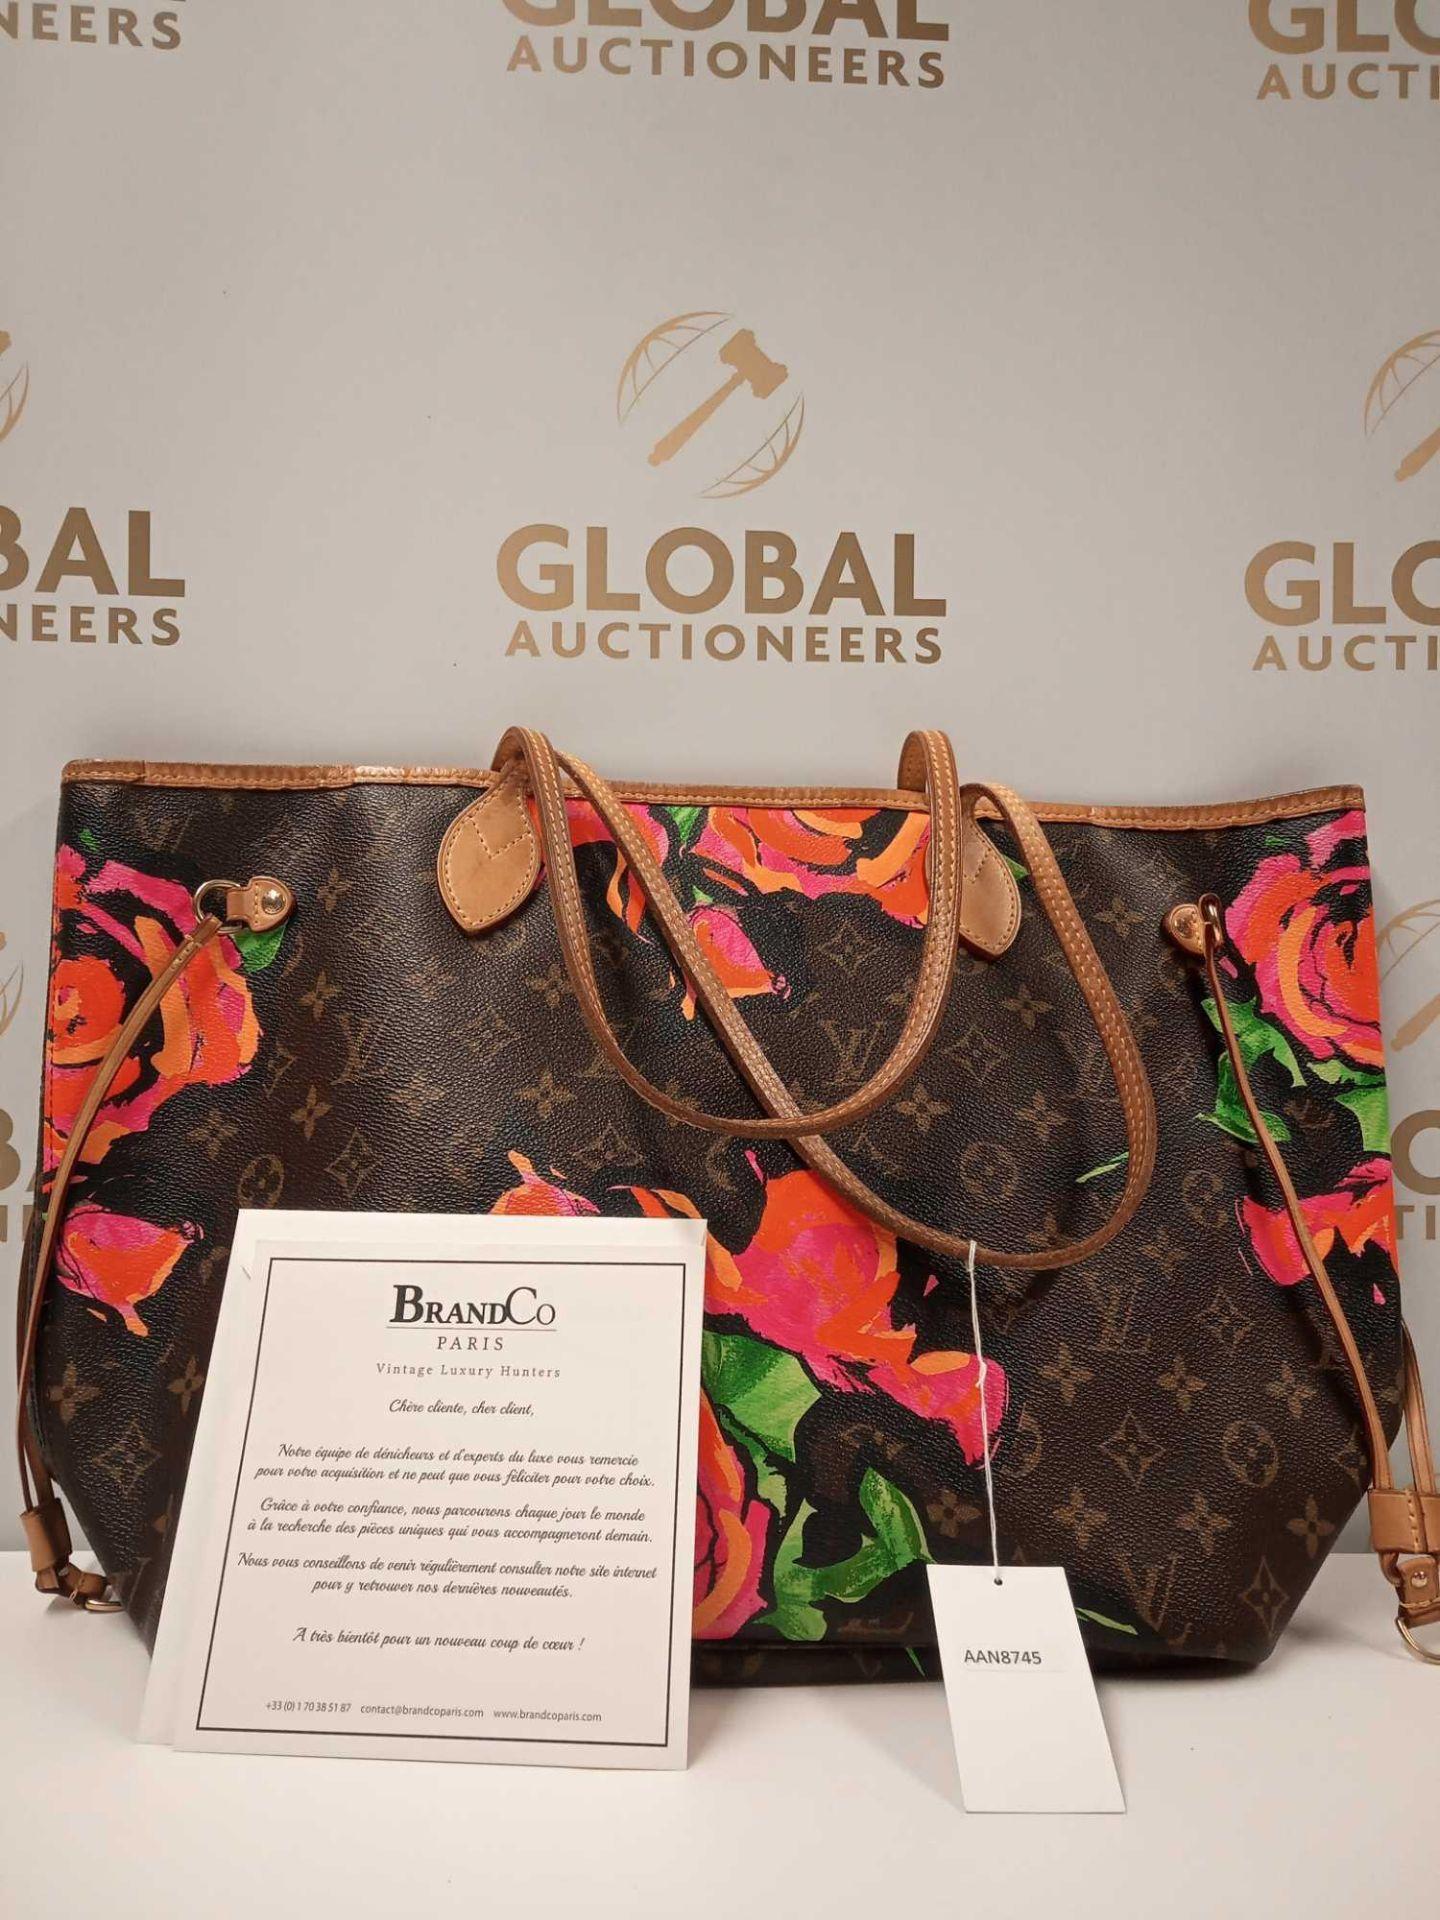 RRP £3000 Louis Vuitton Limited Edition Monogram Roses Shoulder Bag Aan8745, Grade Ab (Appraisals - Image 3 of 4